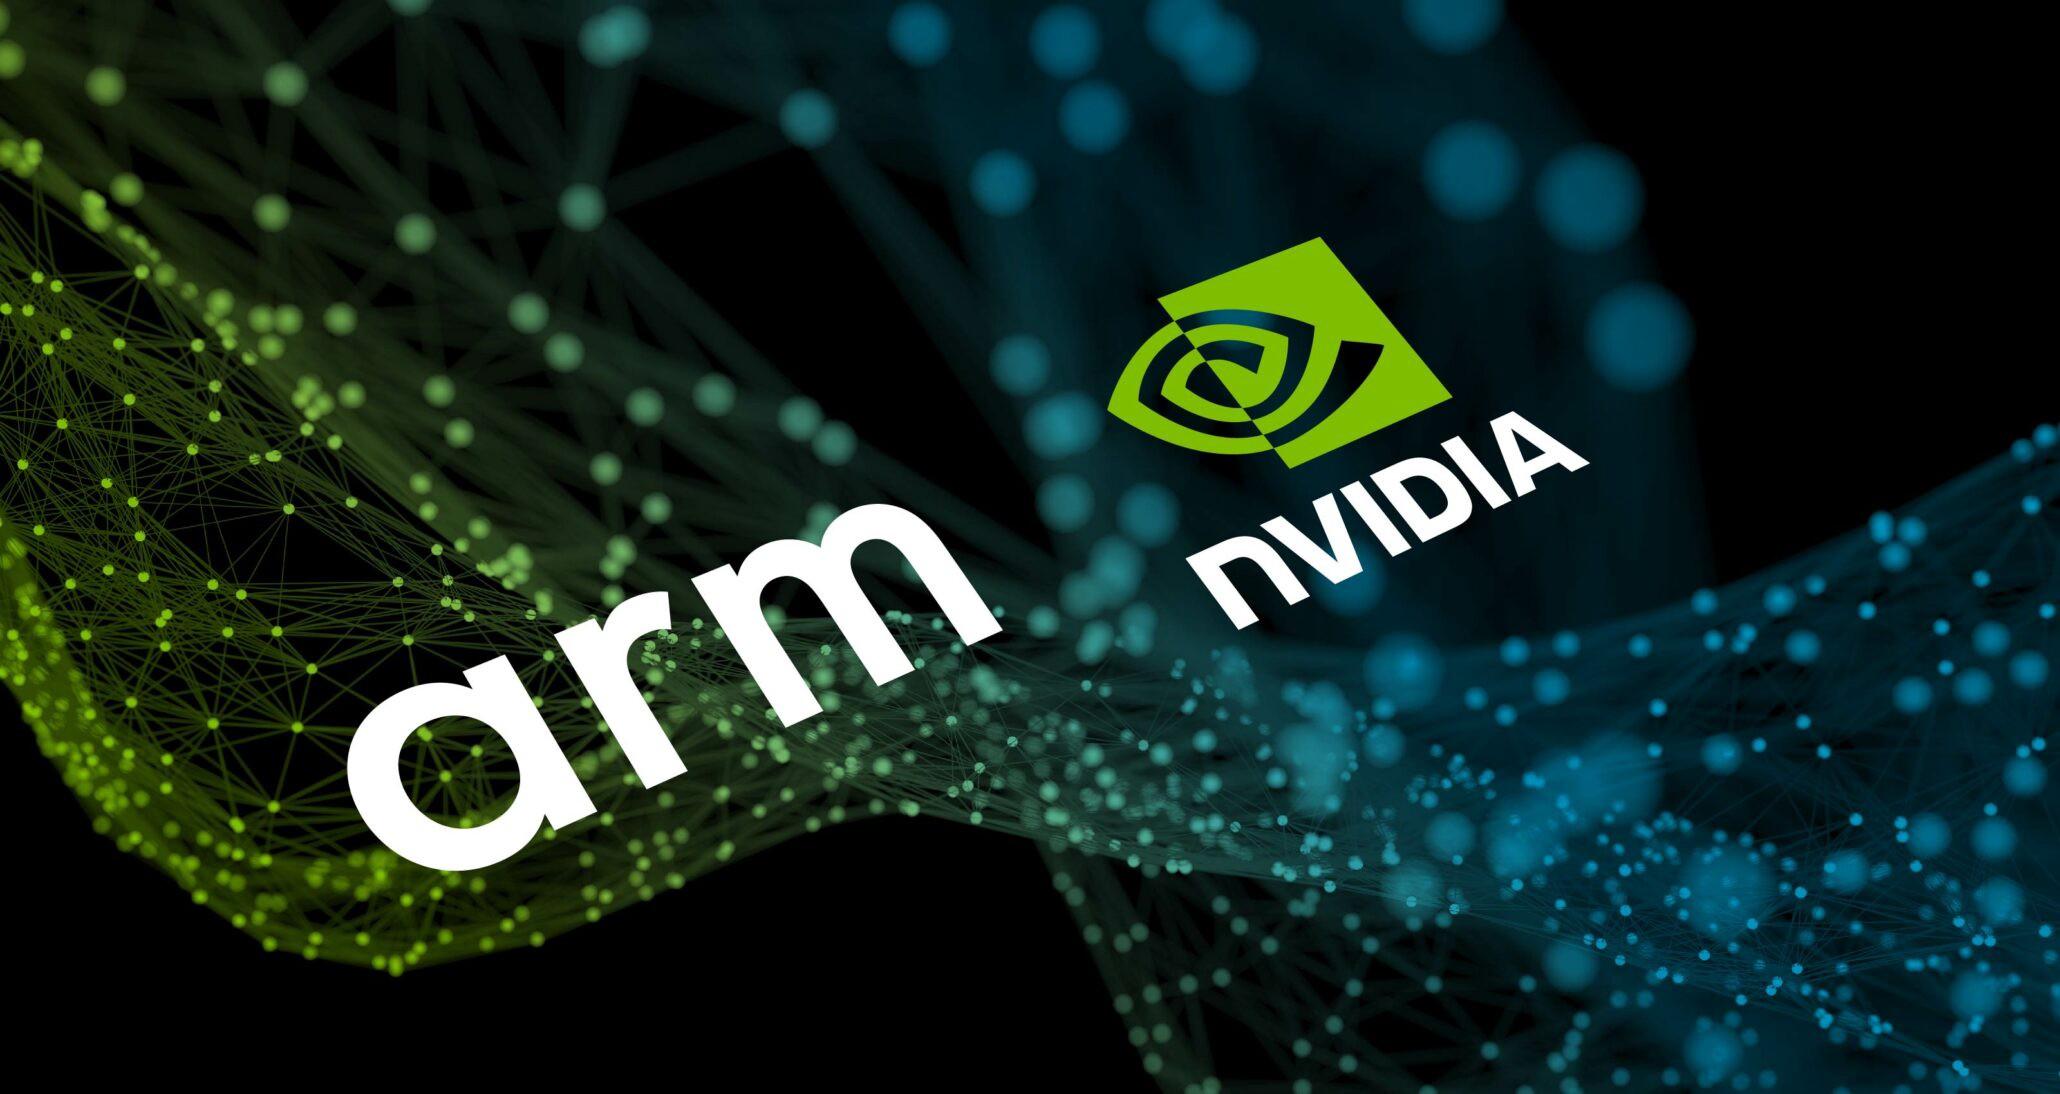 Ufficiale: NVIDIA acquisisce ARM per 40 miliardi di dollari thumbnail